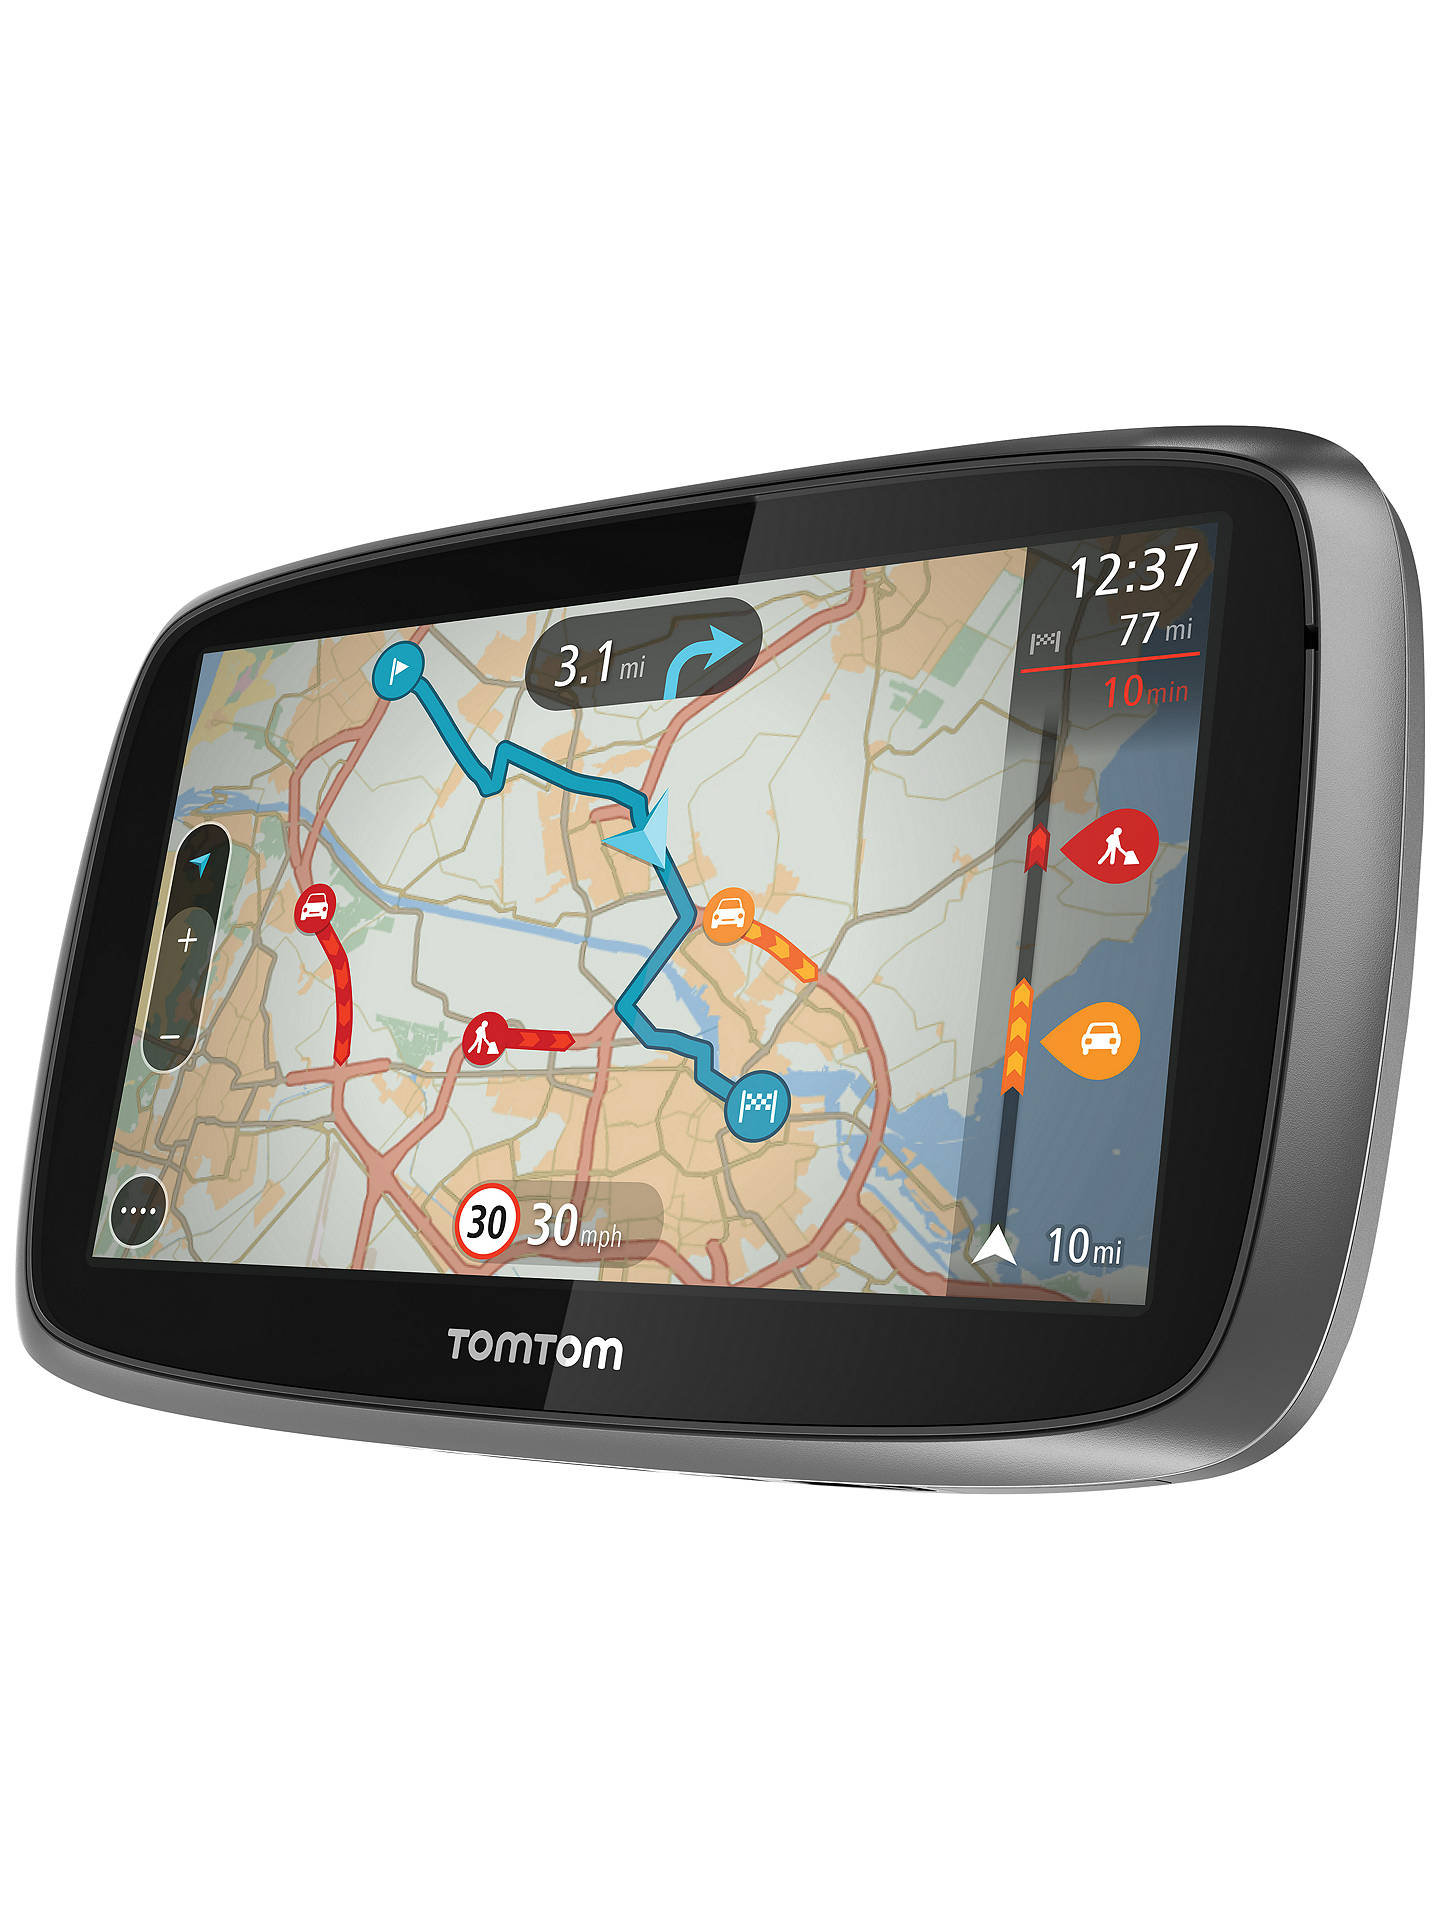 TomTom GO 5000 GPS Navigation System, Europe Maps at John